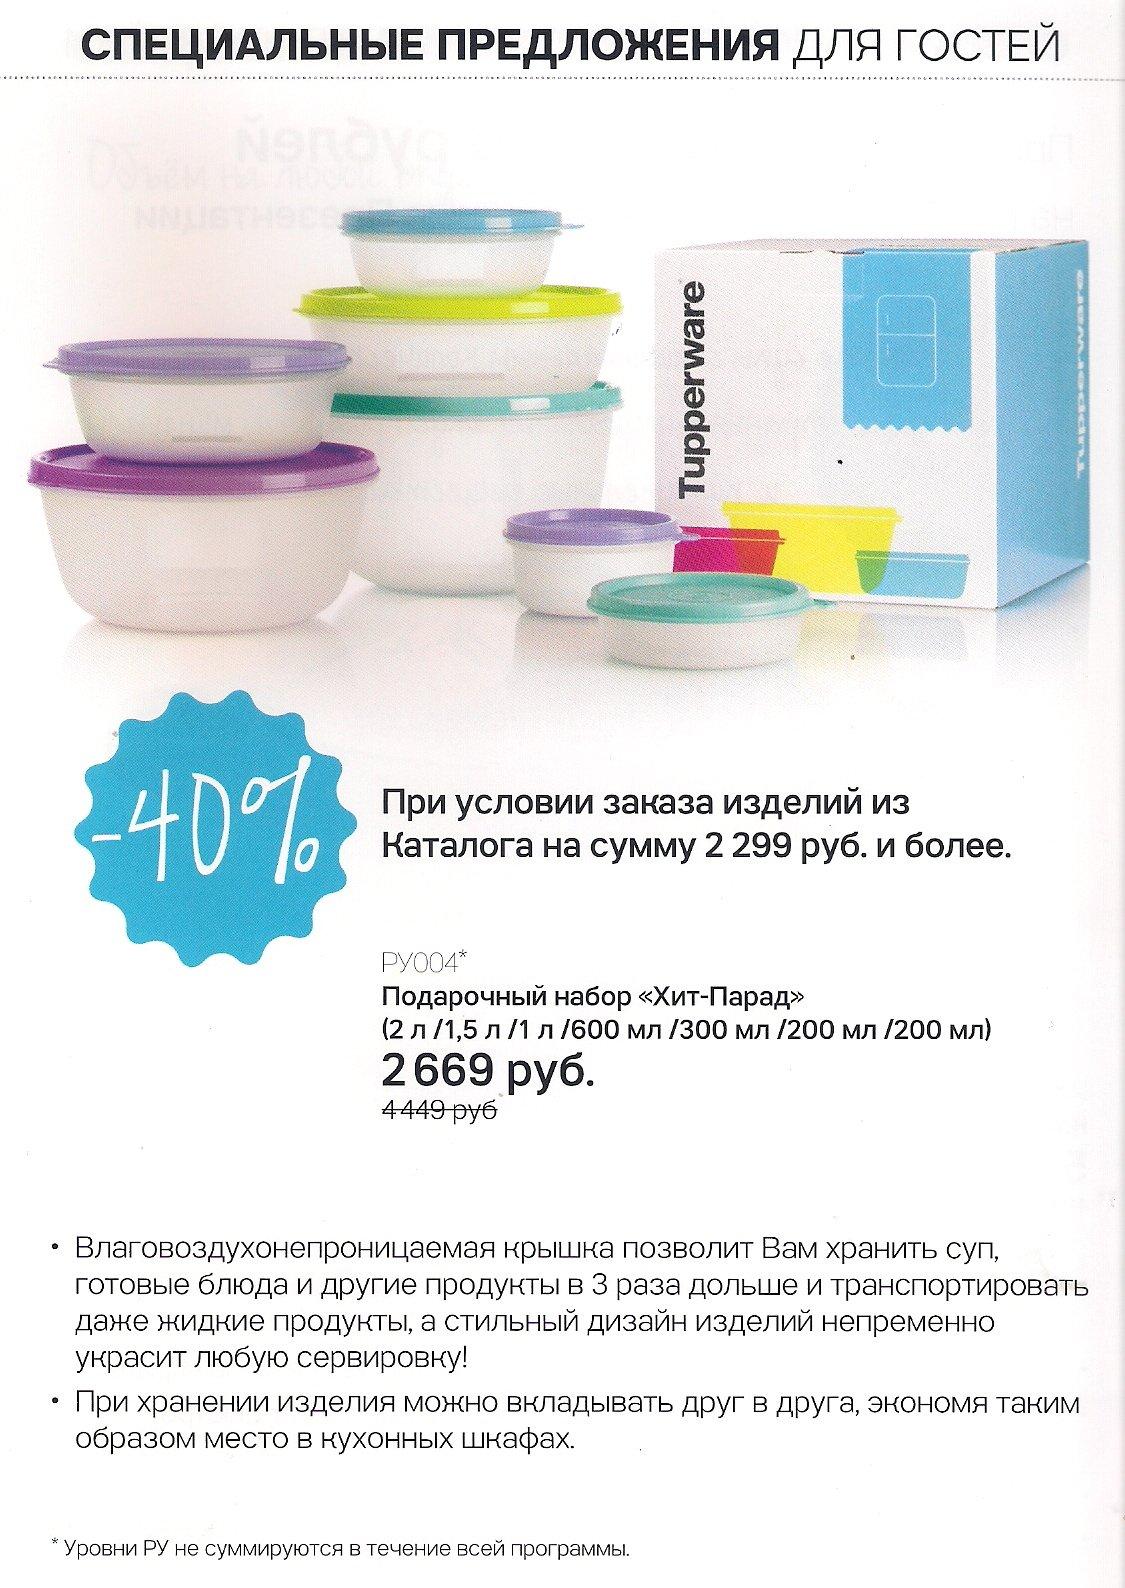 https://tupperware-online.ru/images/upload/8g.jpg